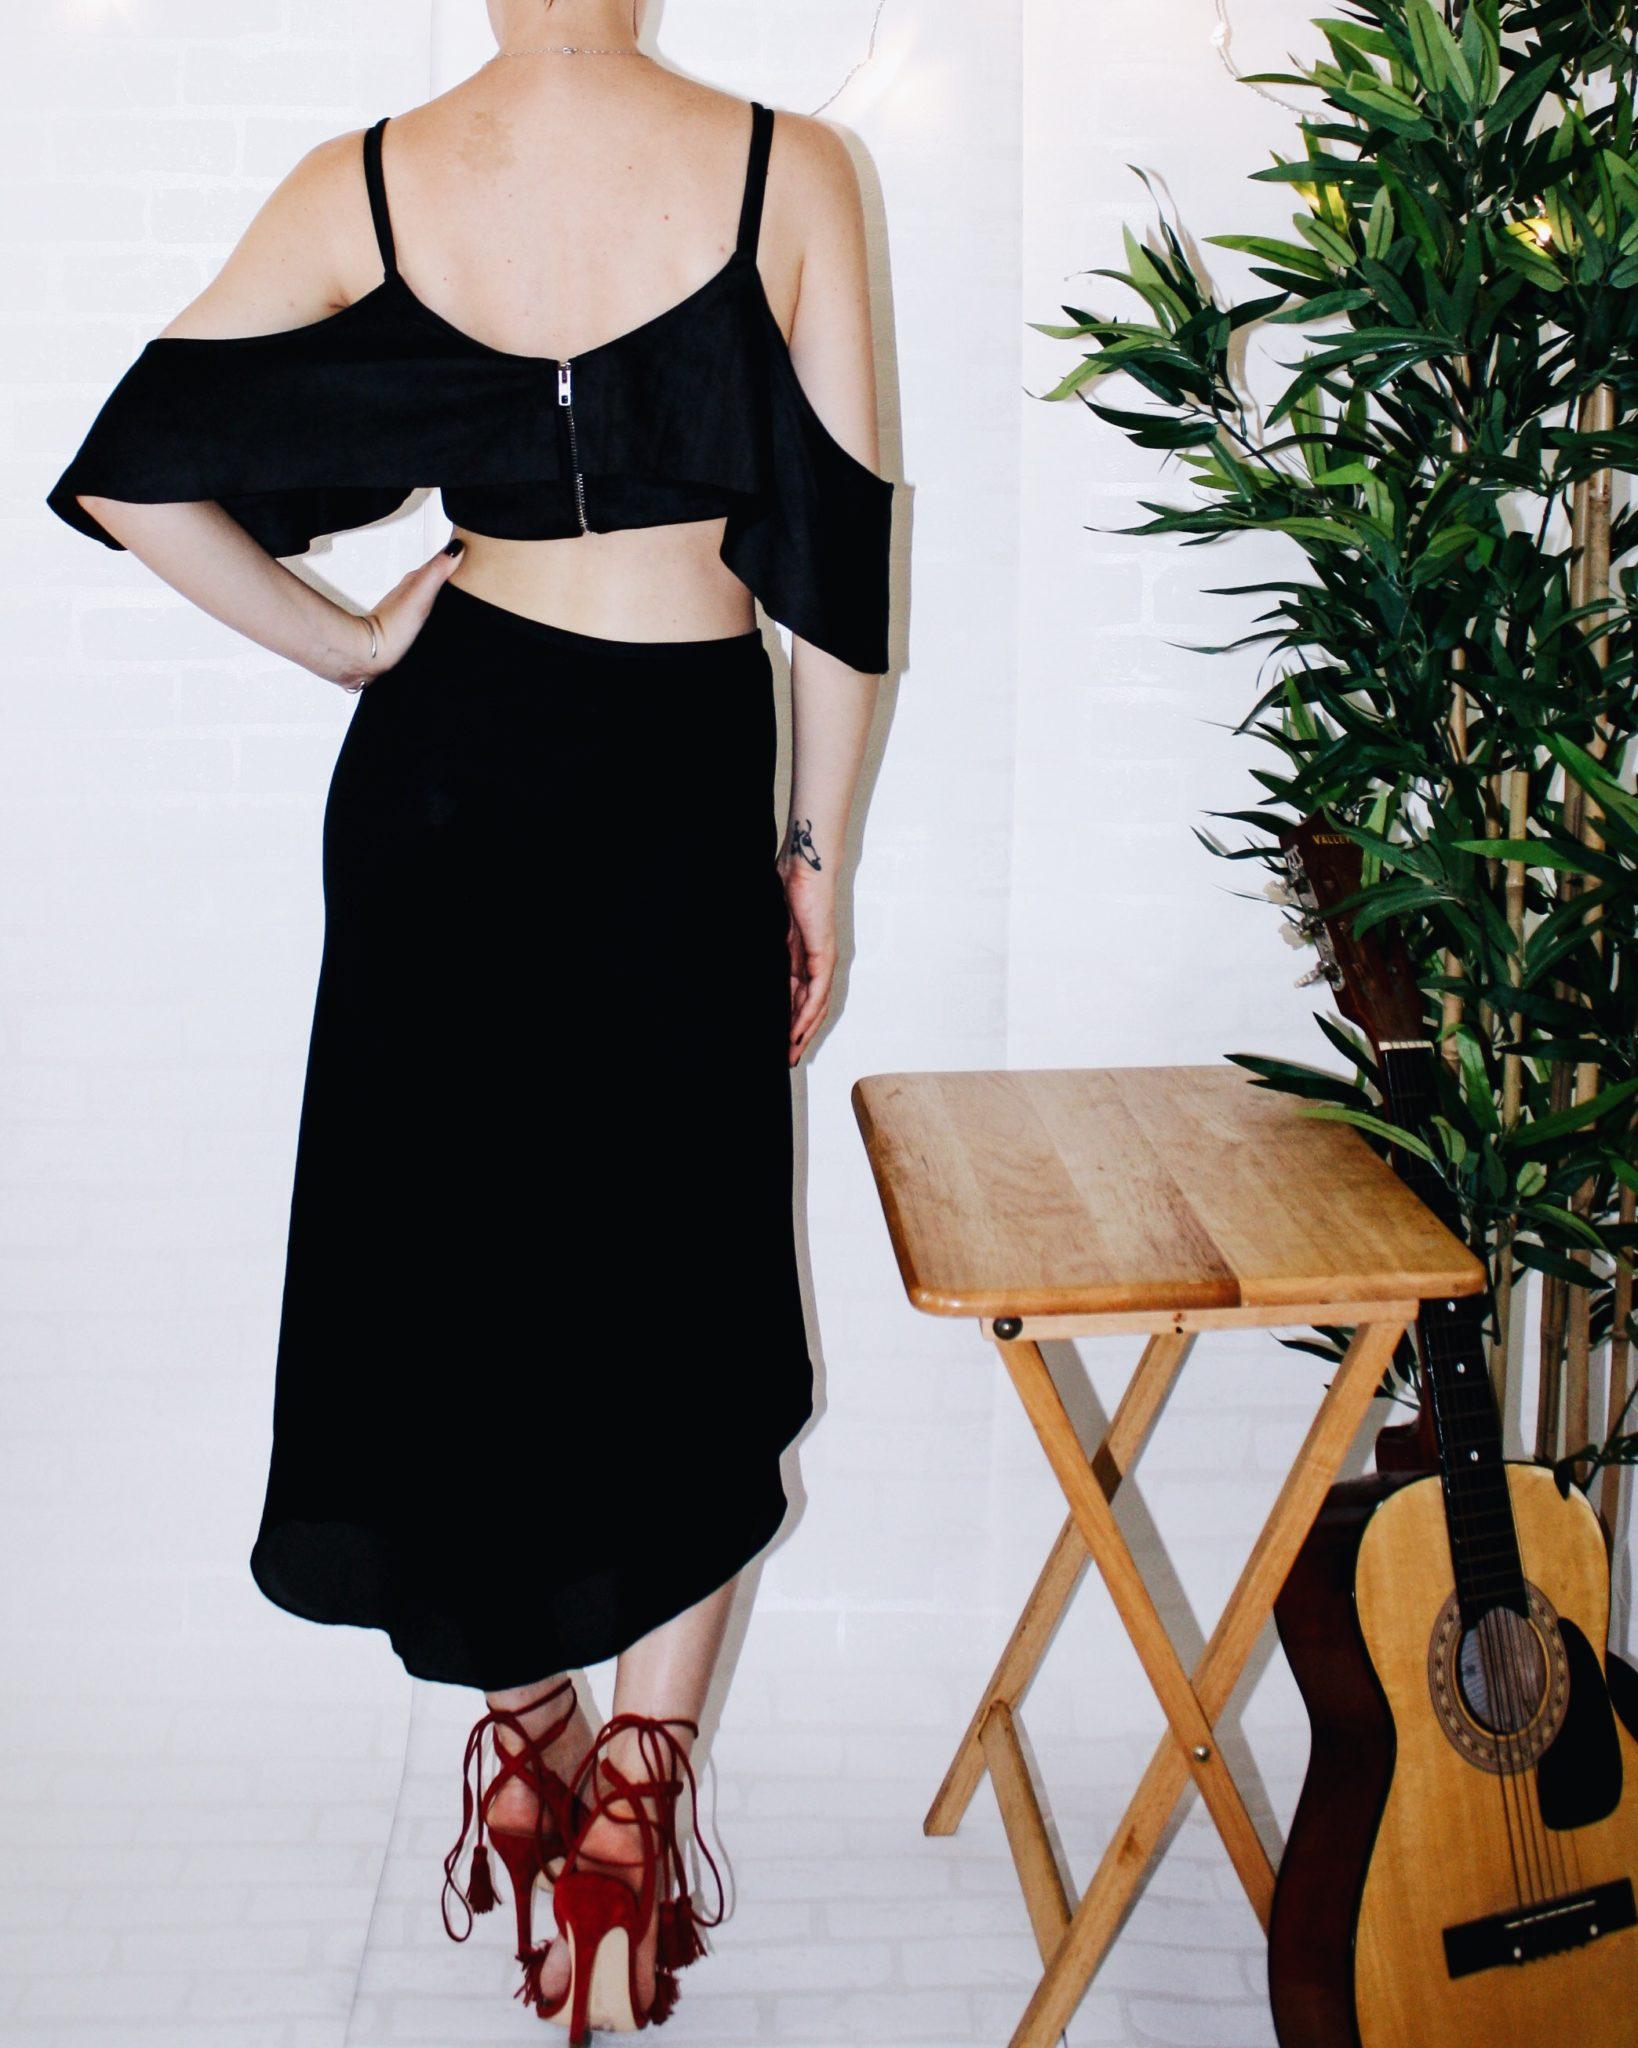 spanish revival bardot top missguided dvf skirt aquazzura shoe guitar zara bag 6